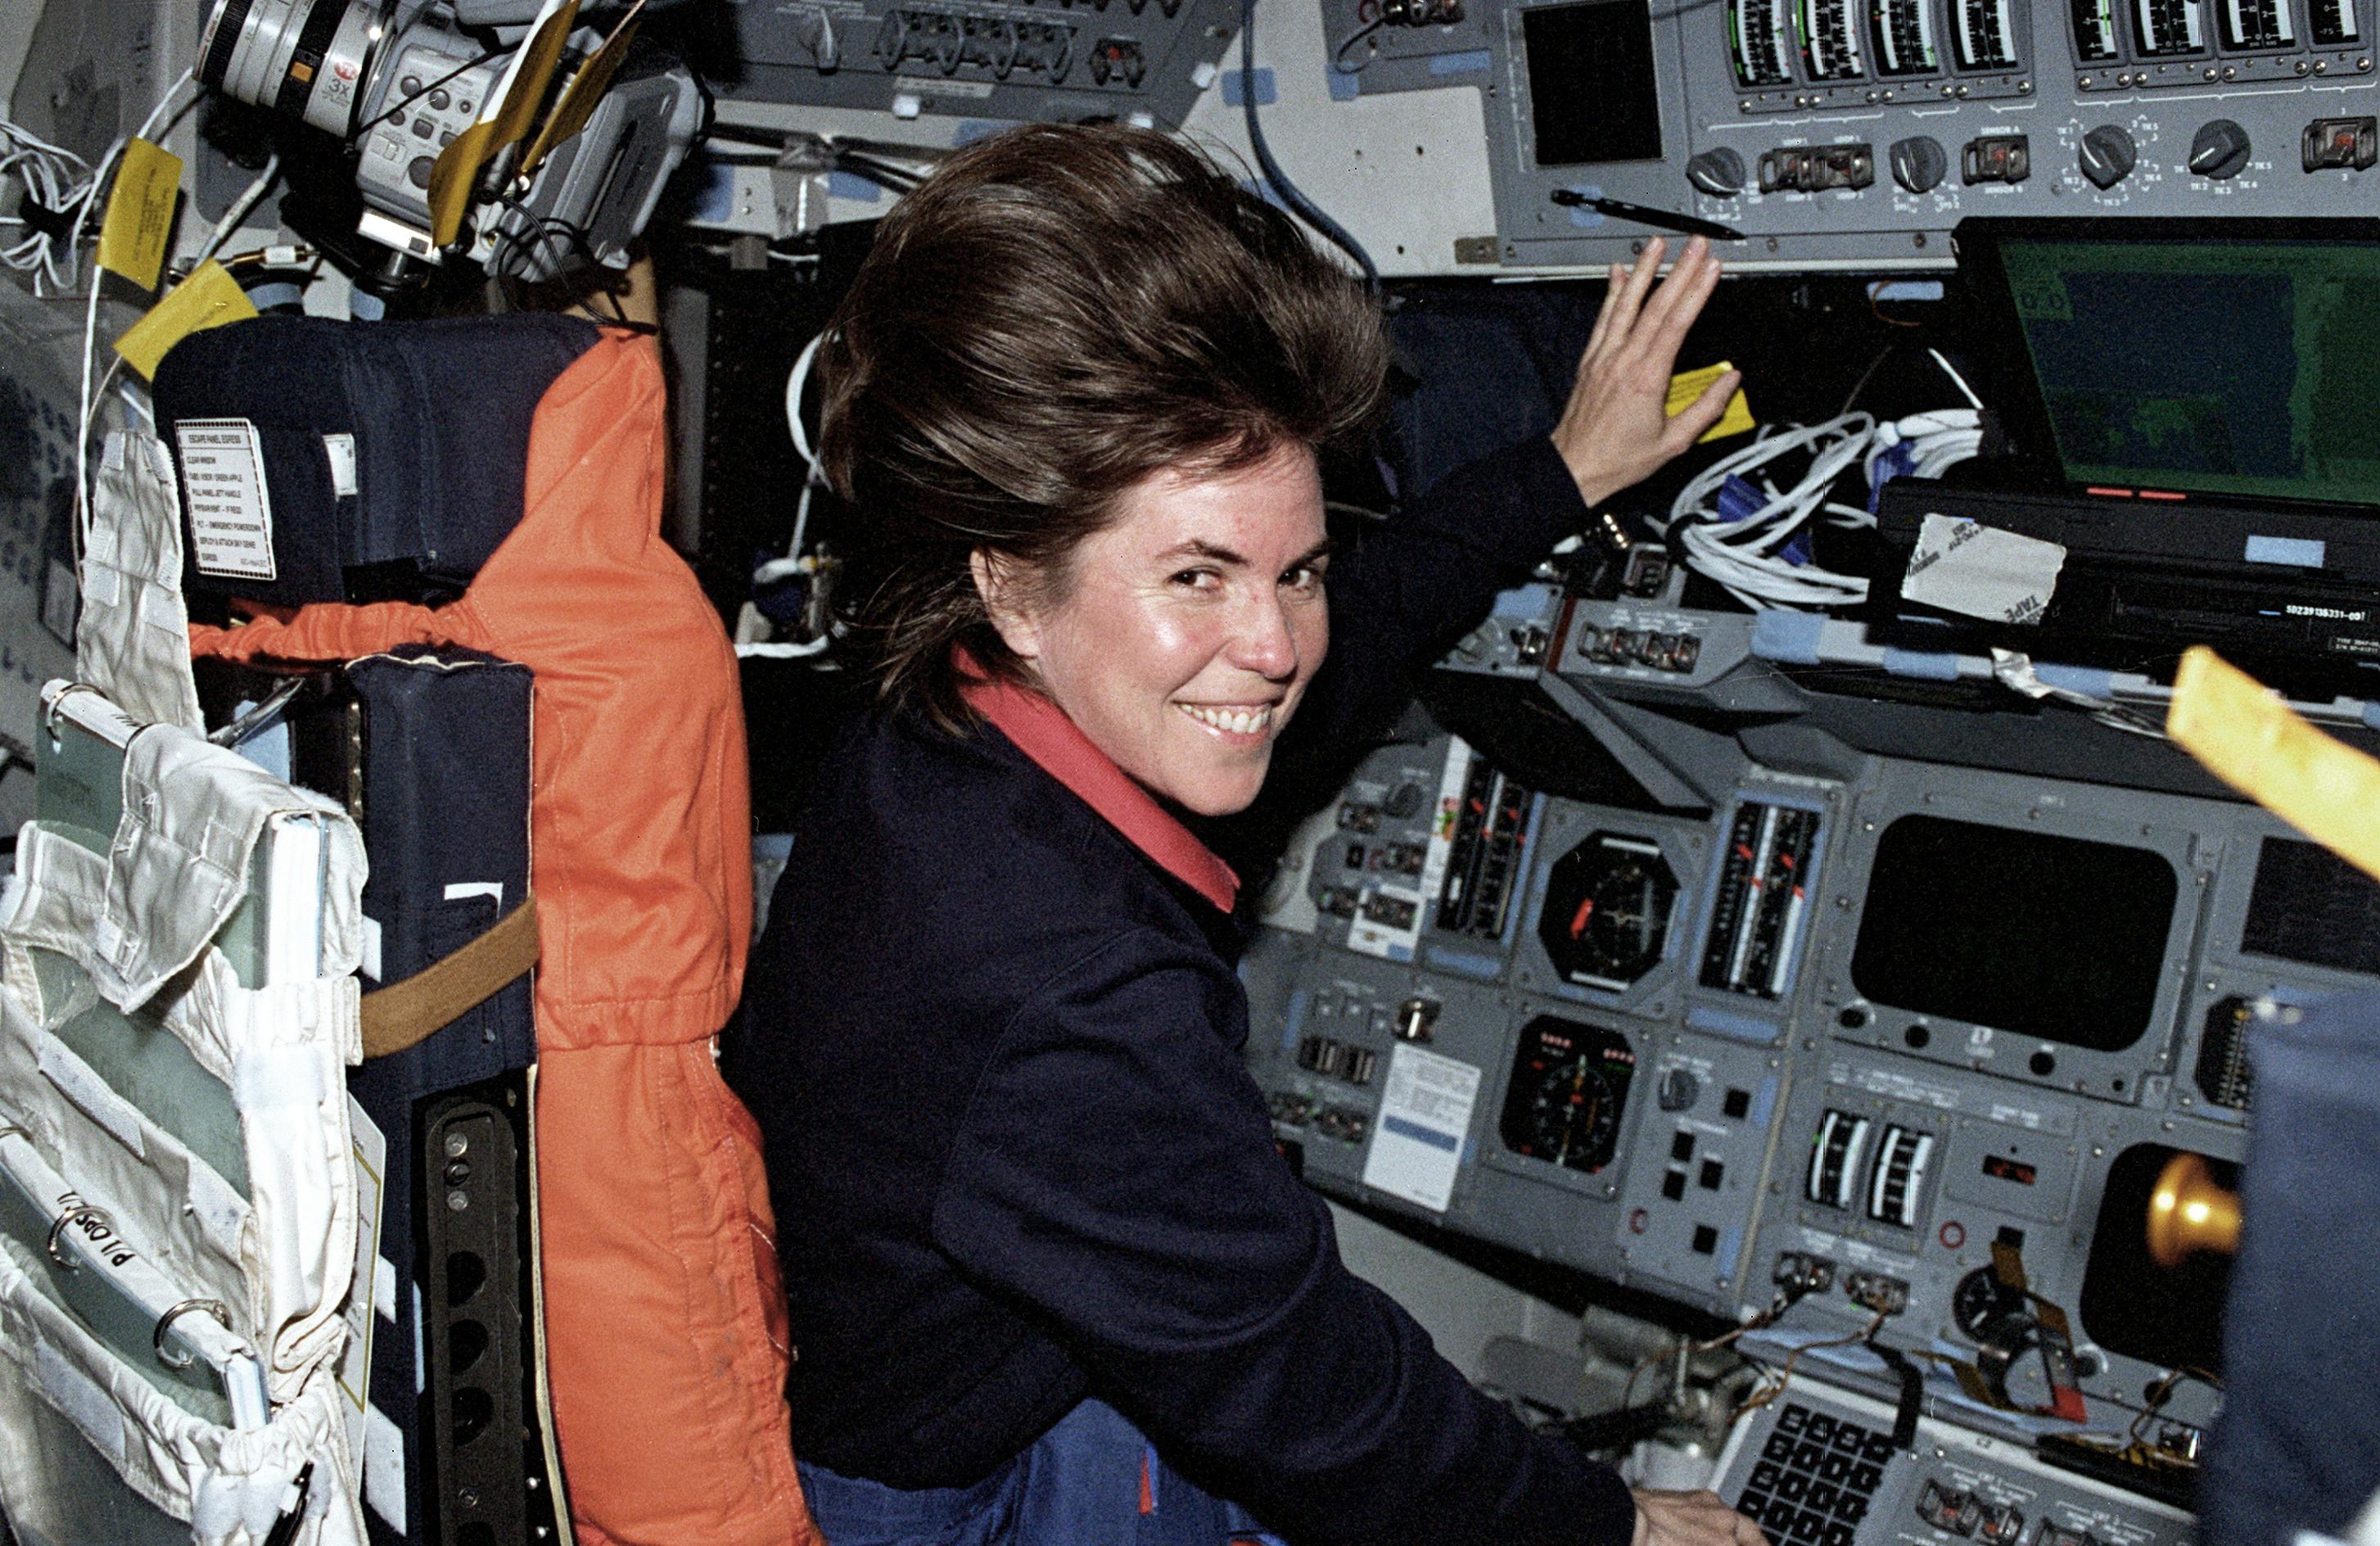 space shuttle astronaut deaths - photo #30